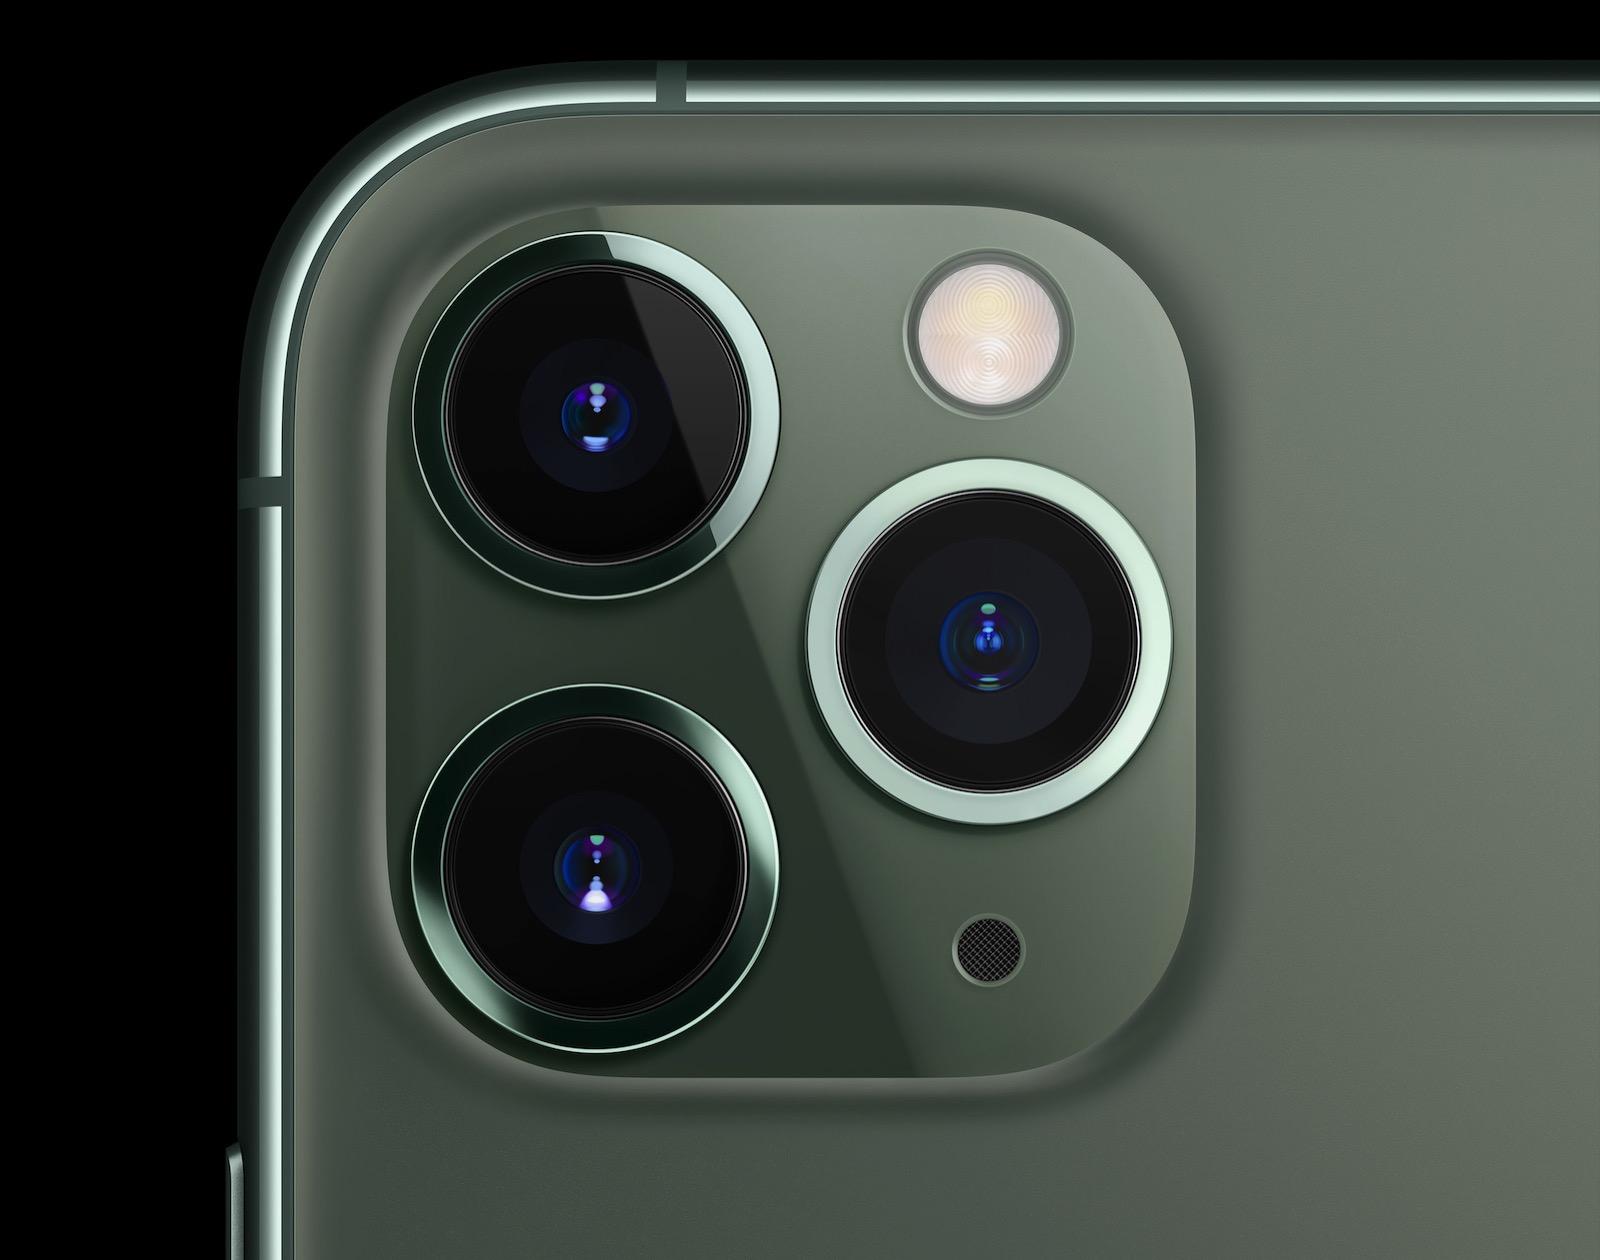 Apple_iPhone-11-Pro_Most-Powerful-Advanced_091019.jpg